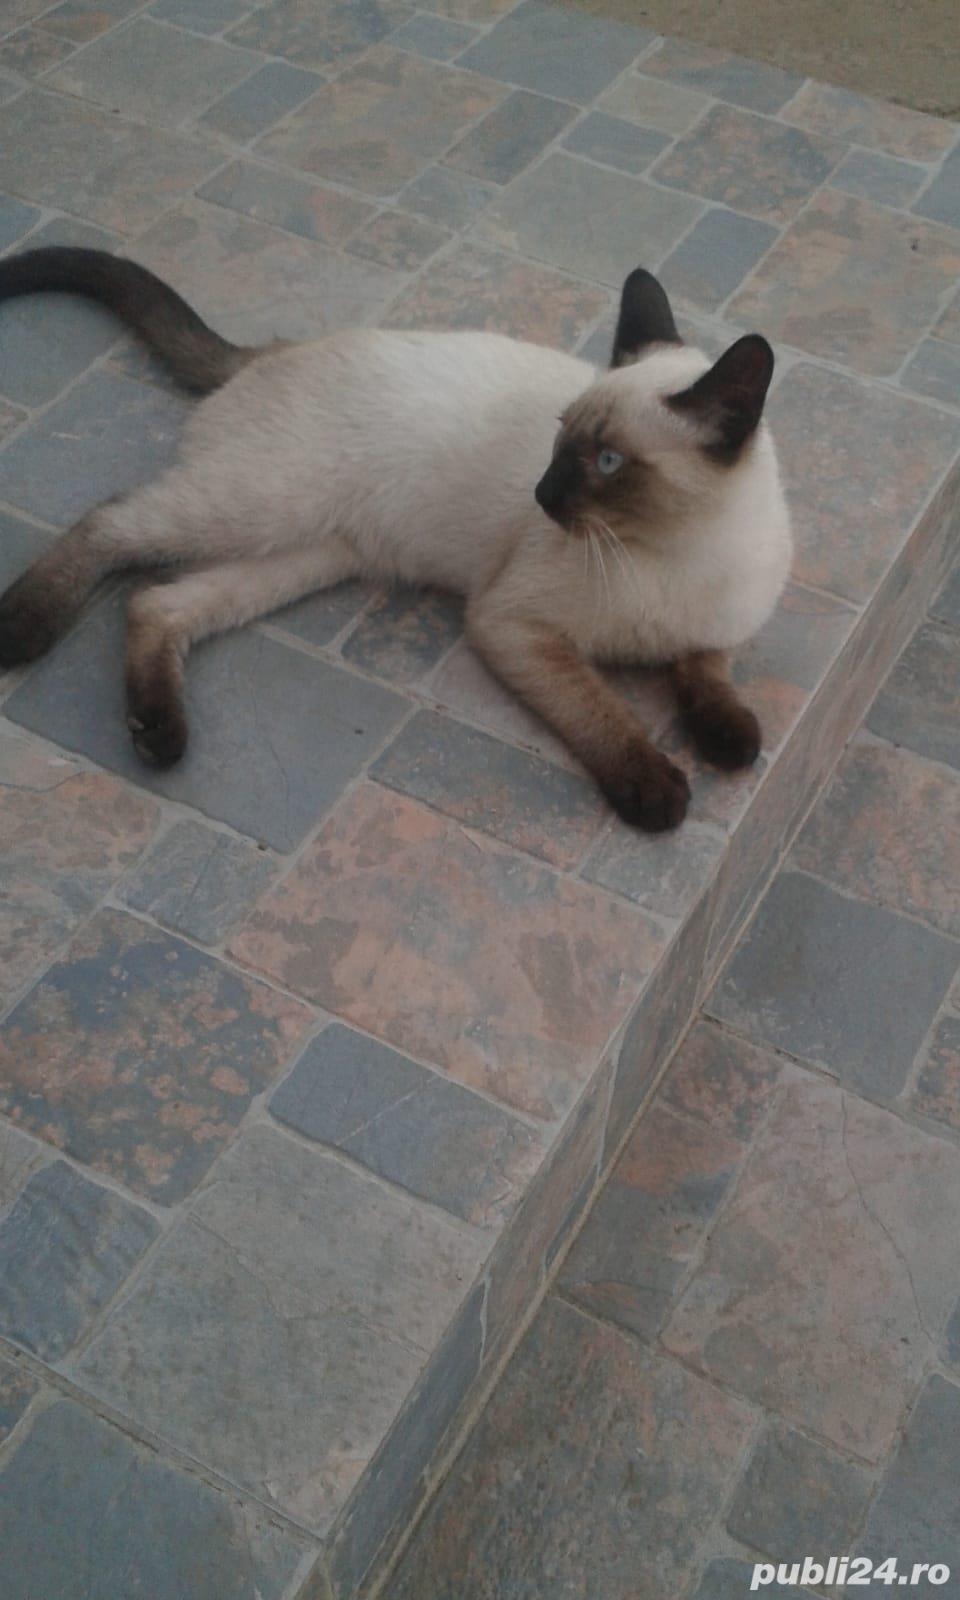 Vand pisica Birmaneza pret 200 lei